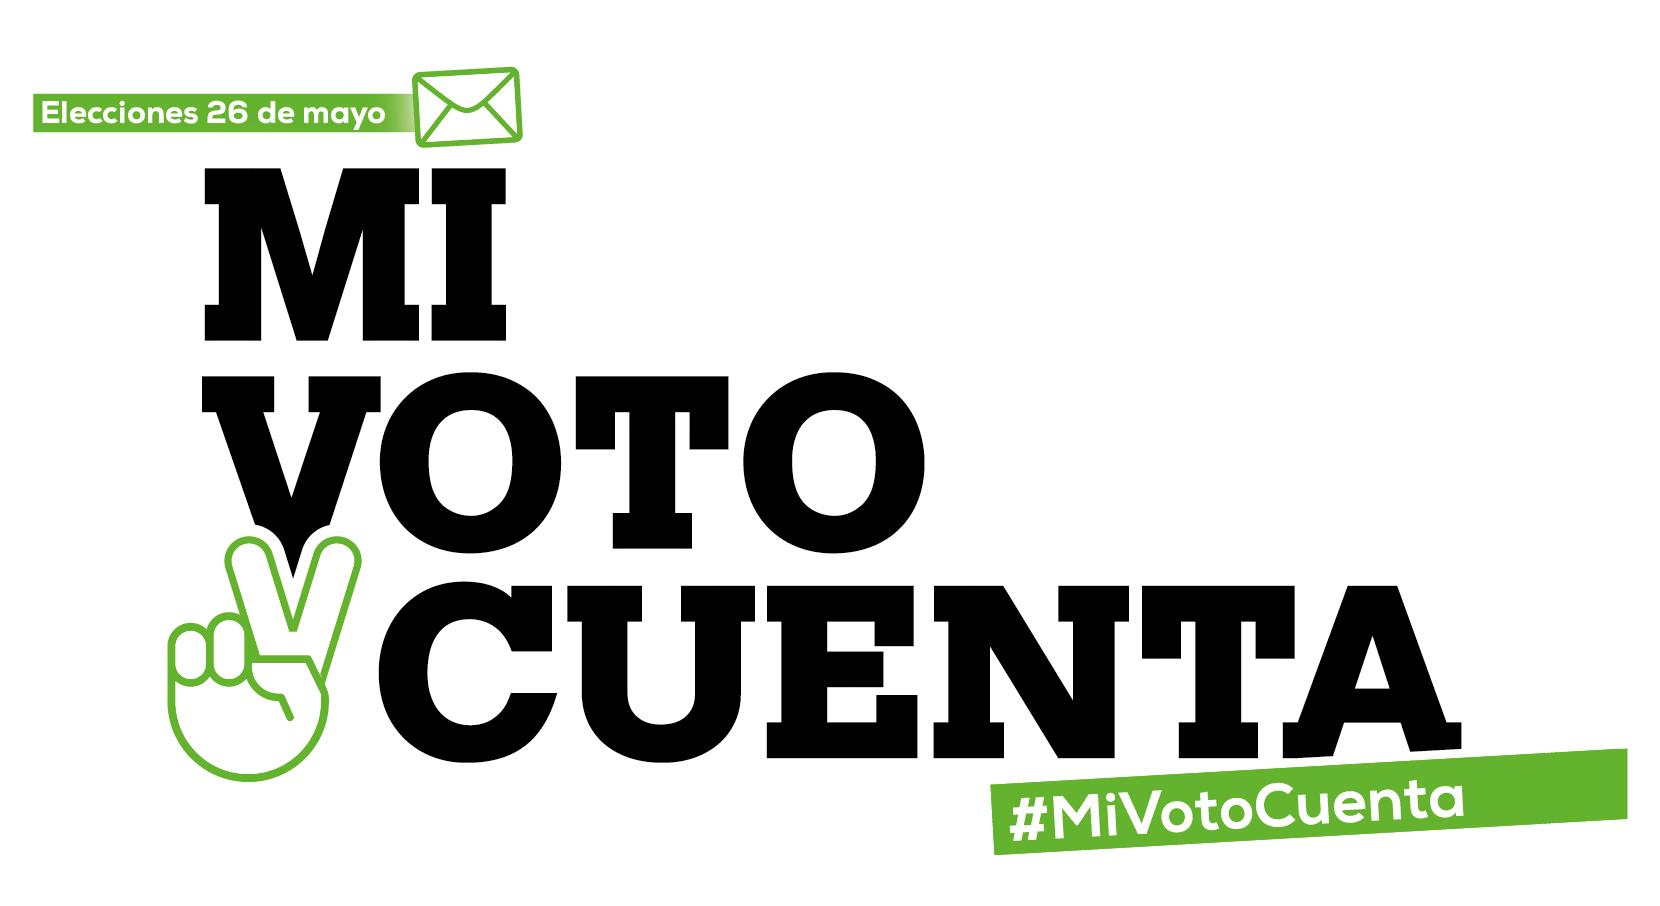 Logotipo de campaña MiVotoCuenta